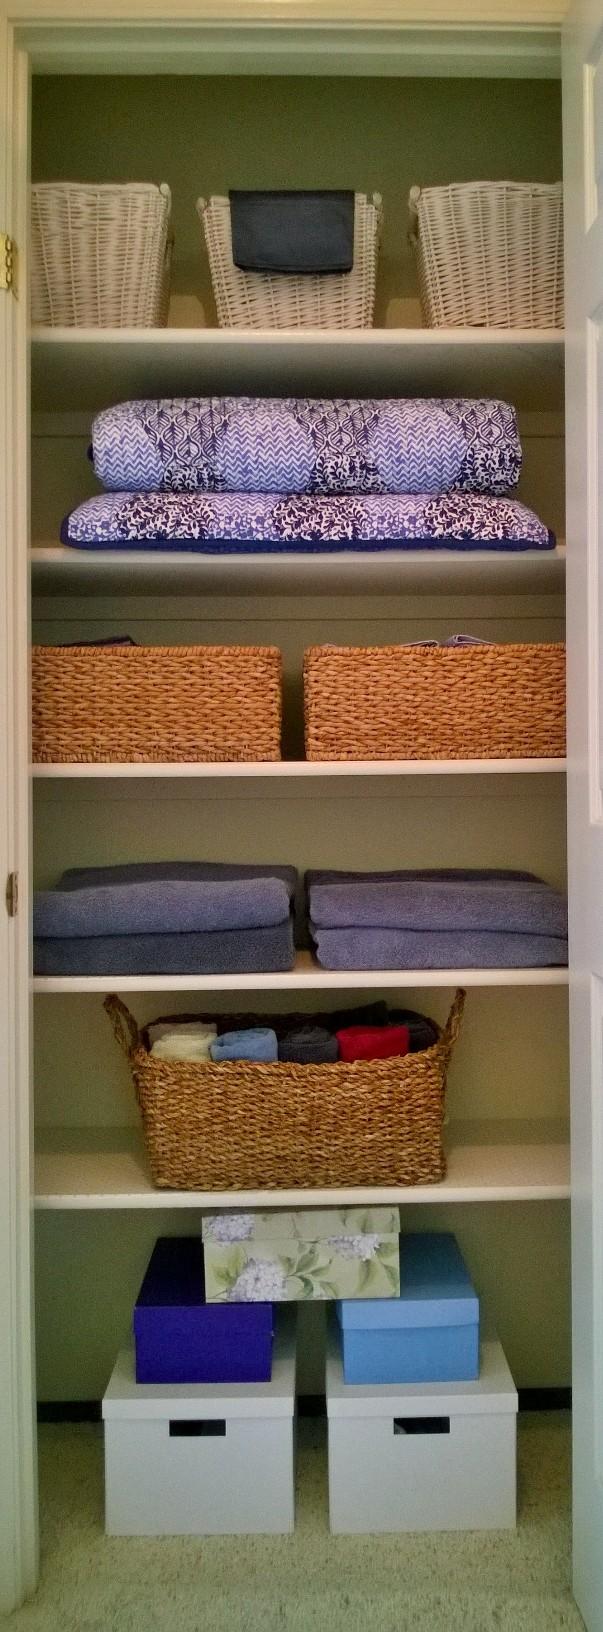 Linen Closet Stage.jpg